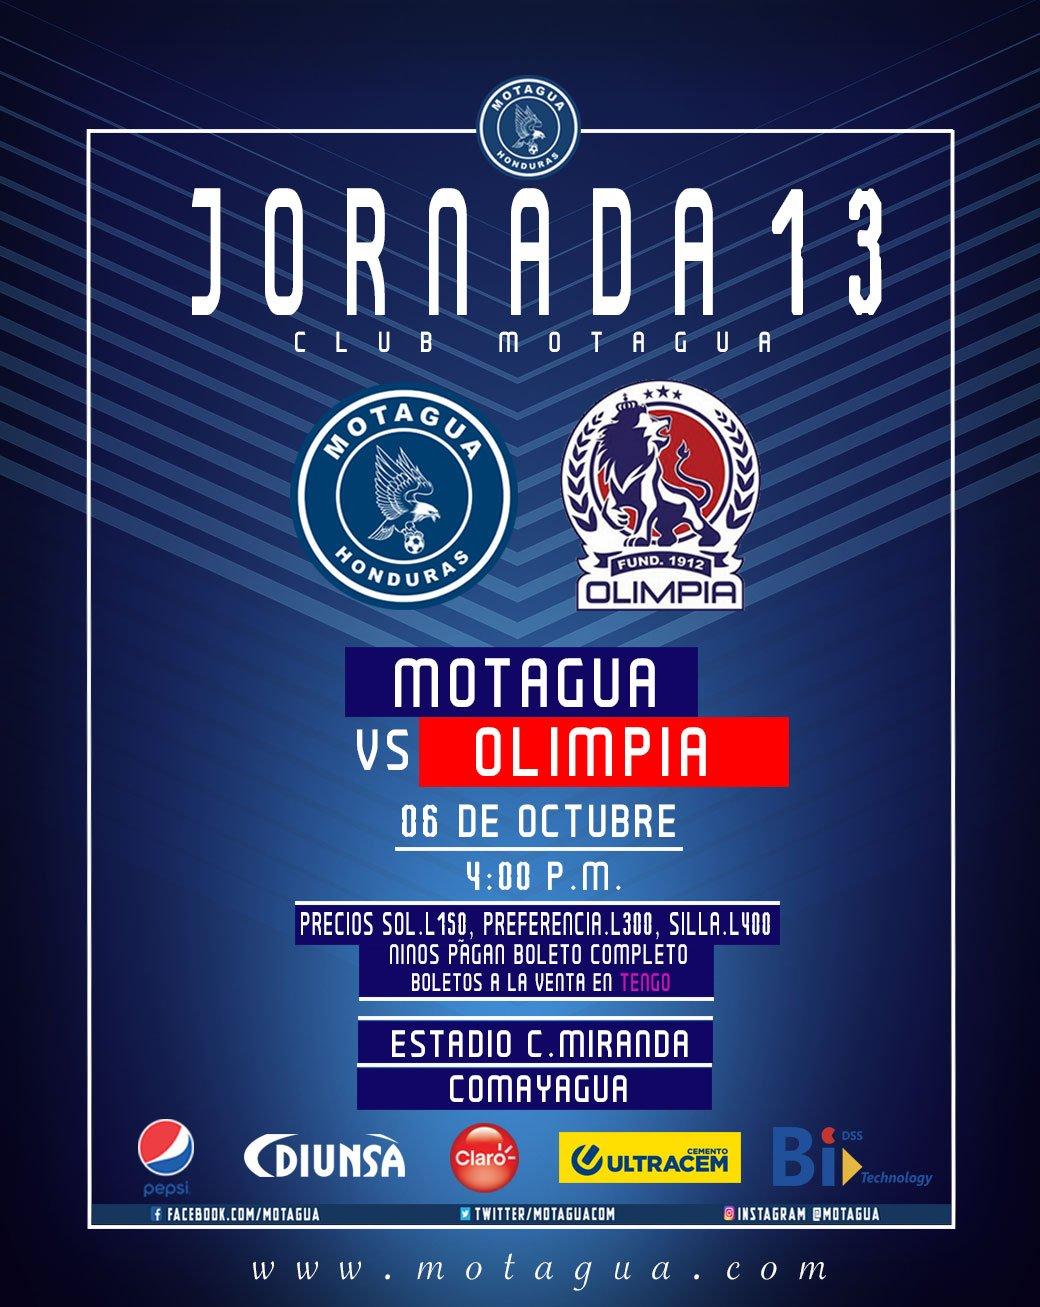 Motagua_Olimpia